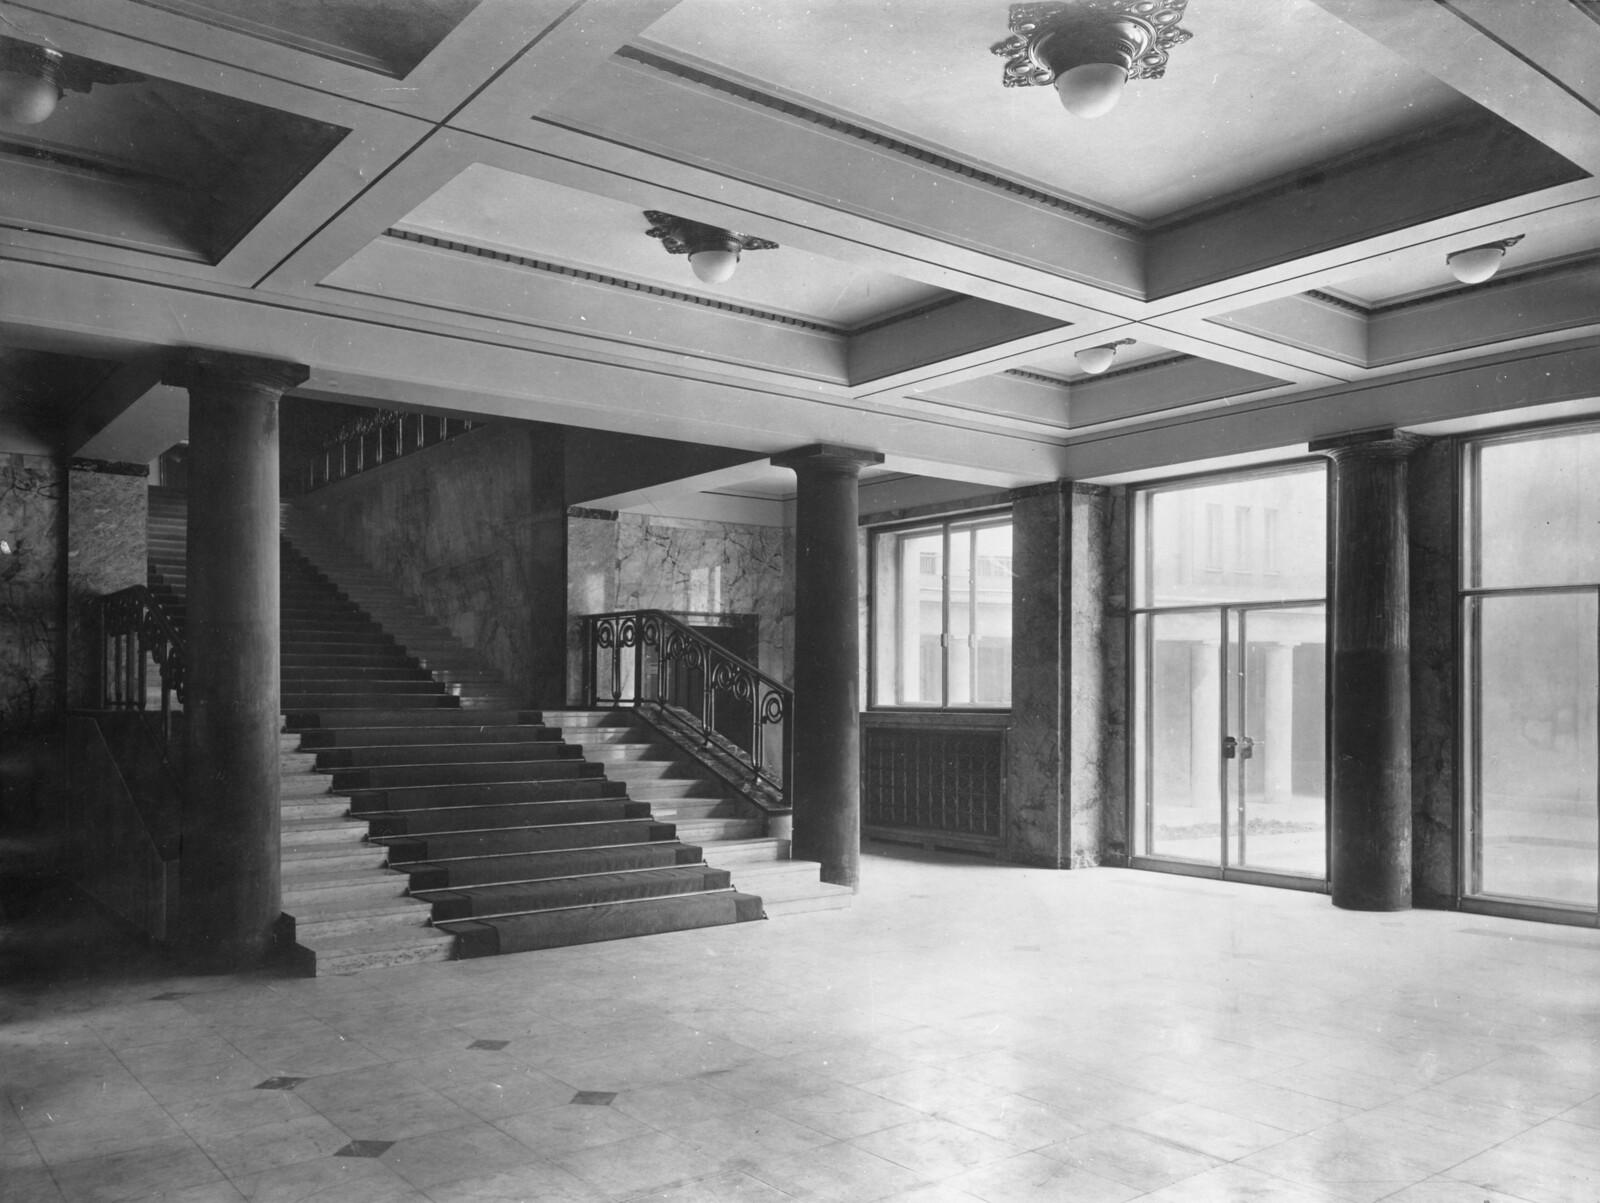 Главная лестница, первый этаж